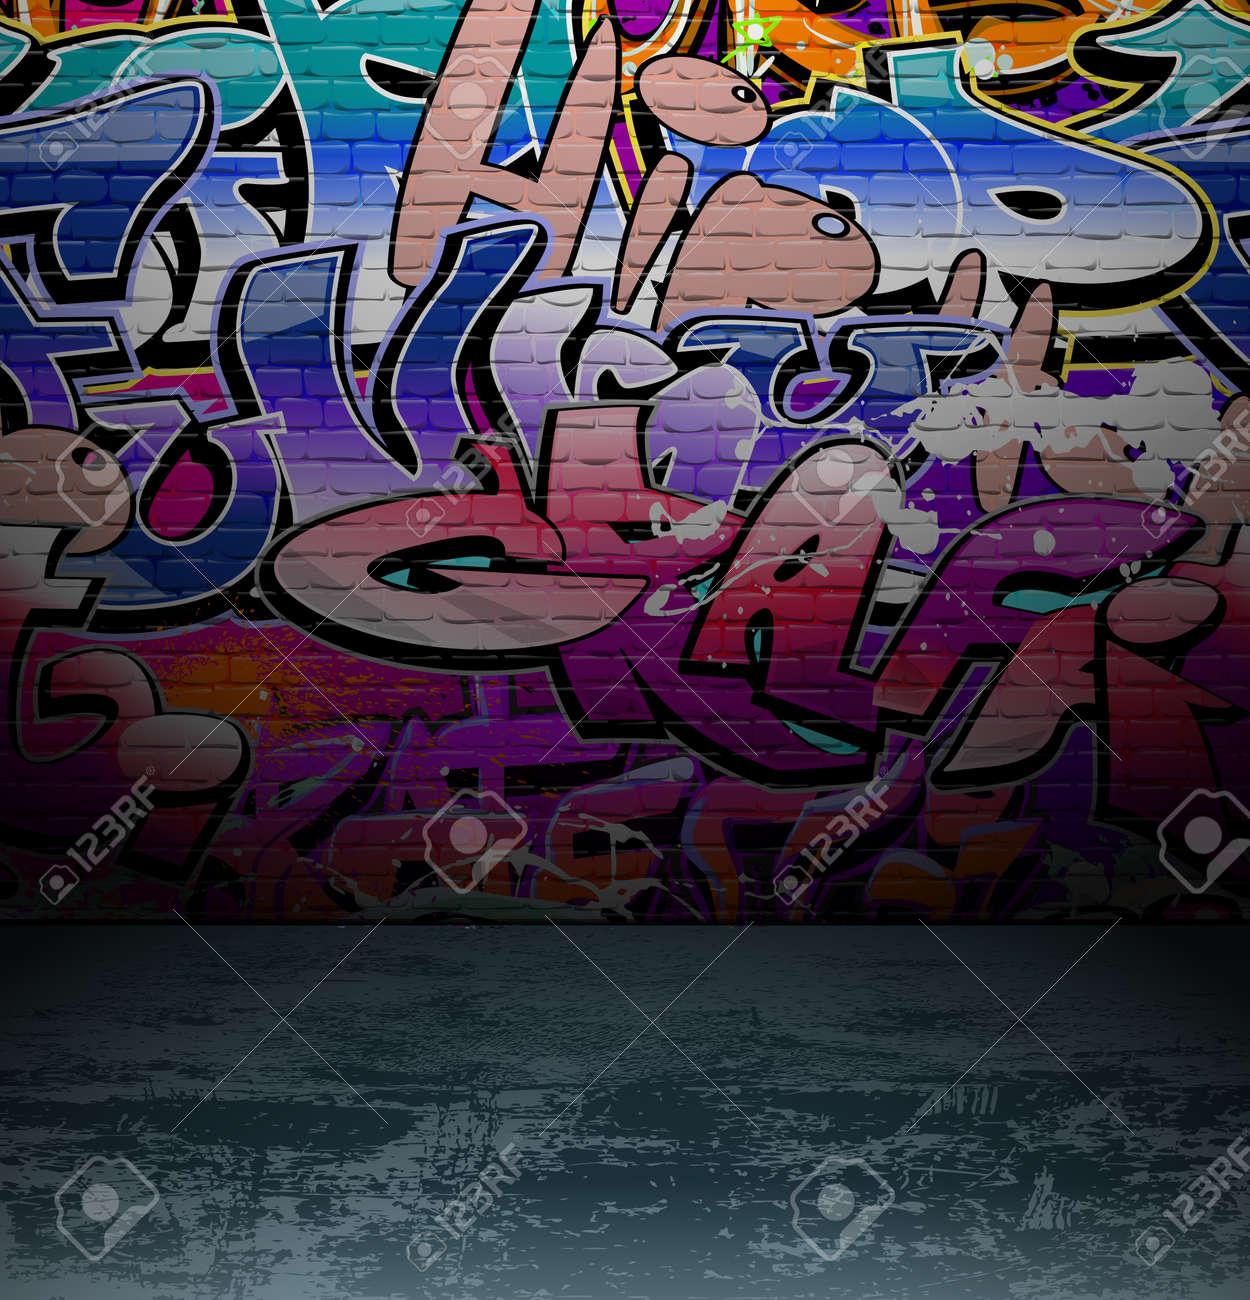 Graffiti wall vector free - Graffiti Wall Background Urban Street Grunge Art Vector Design Stock Vector 12486244